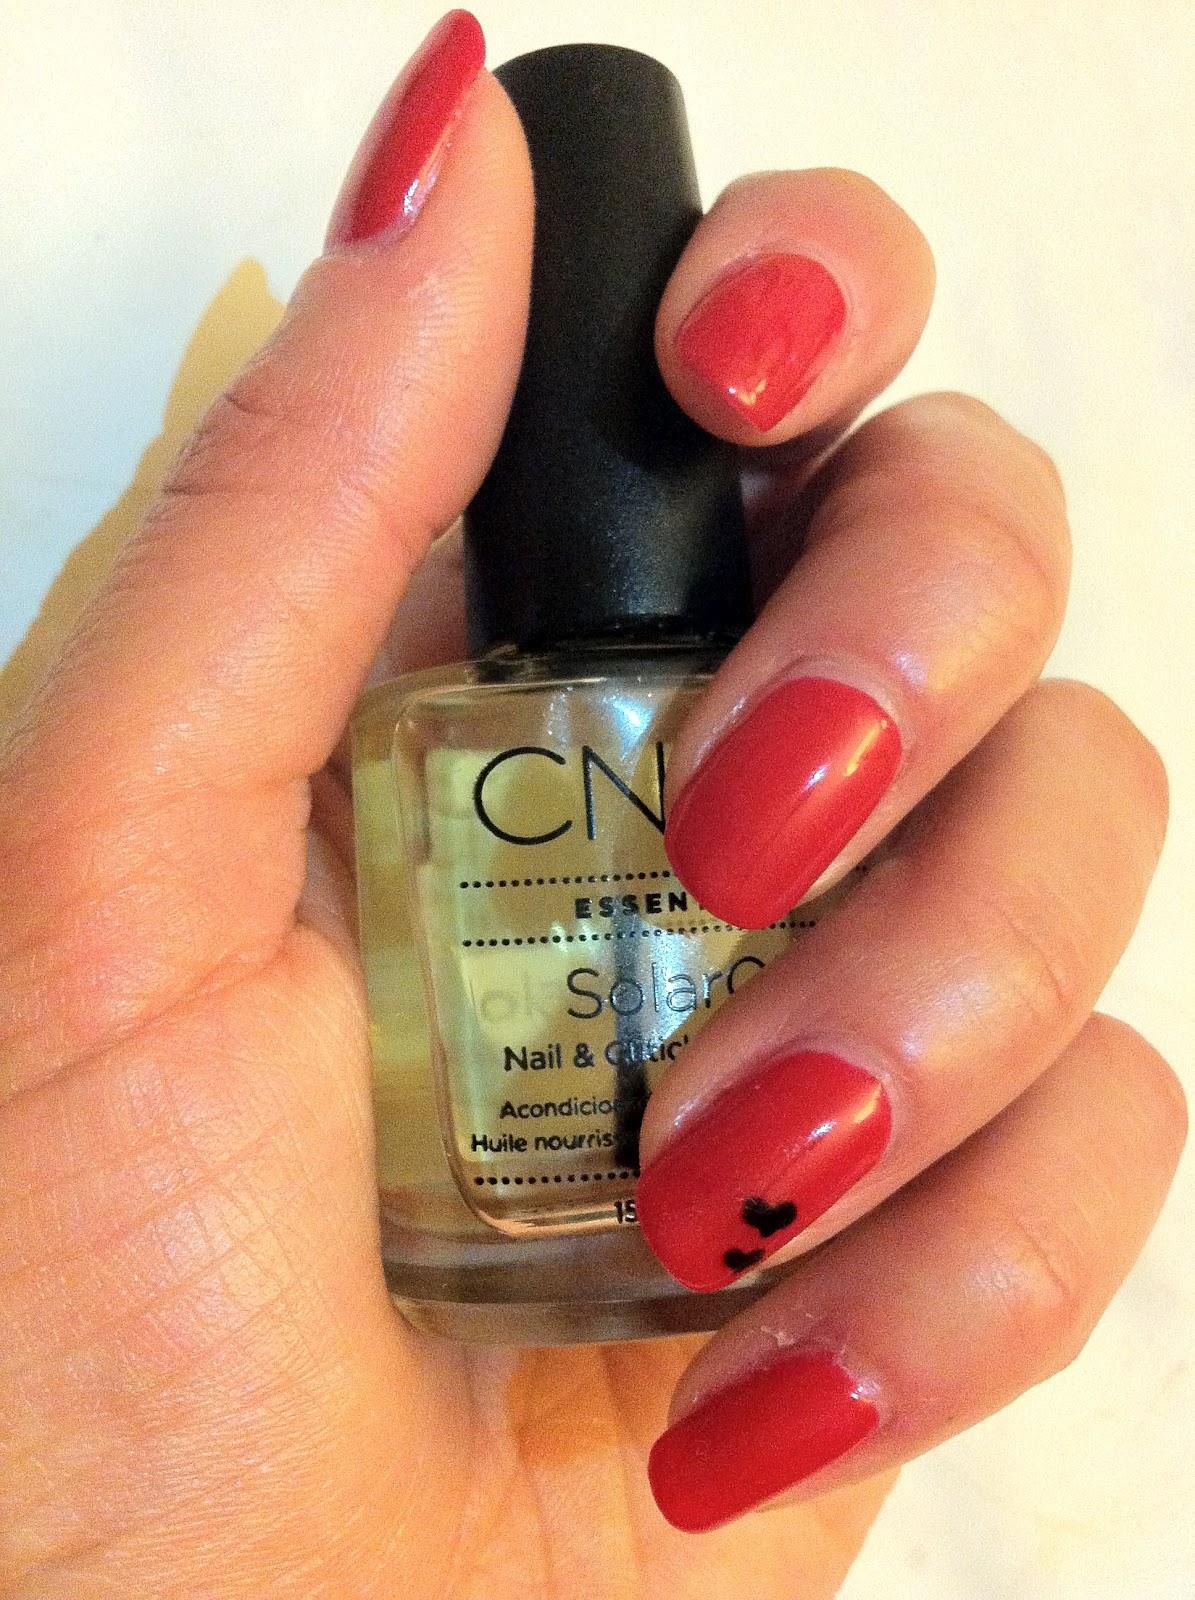 Brush Up And Polish Up!: CND Shellac Wildfire Experimentation